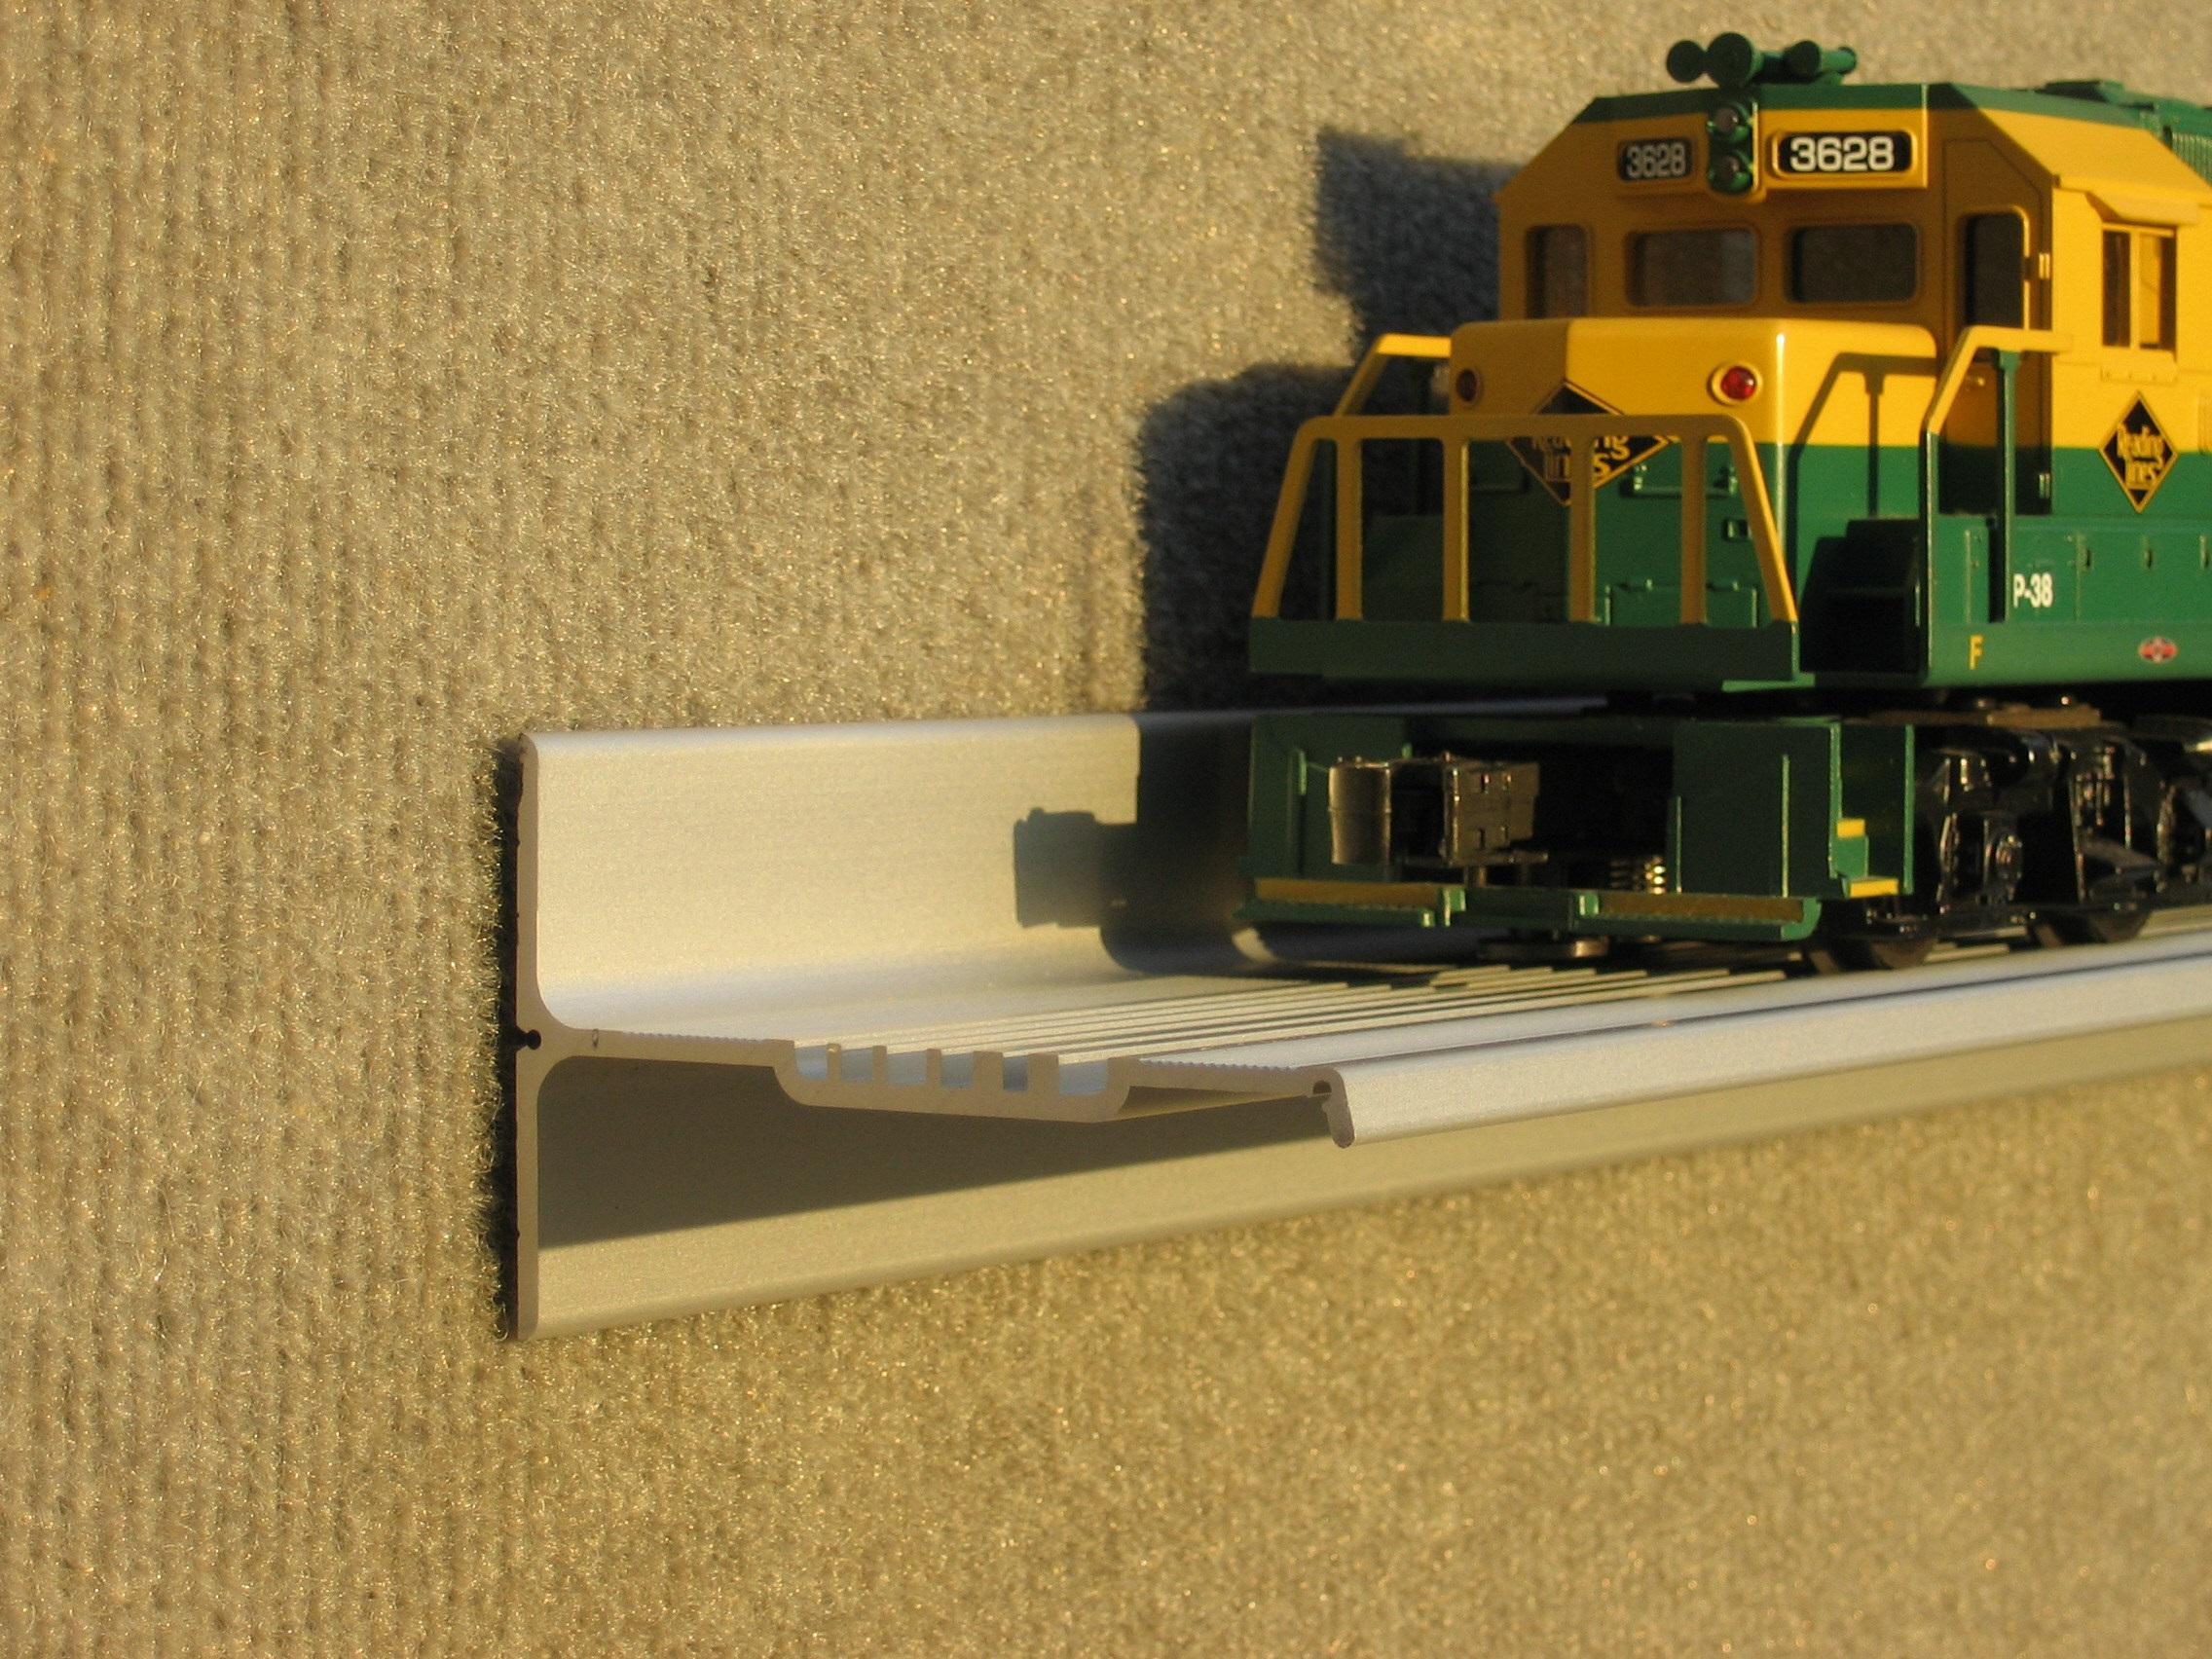 Trainshelf Aluminum Model Toy Train Display Shelves